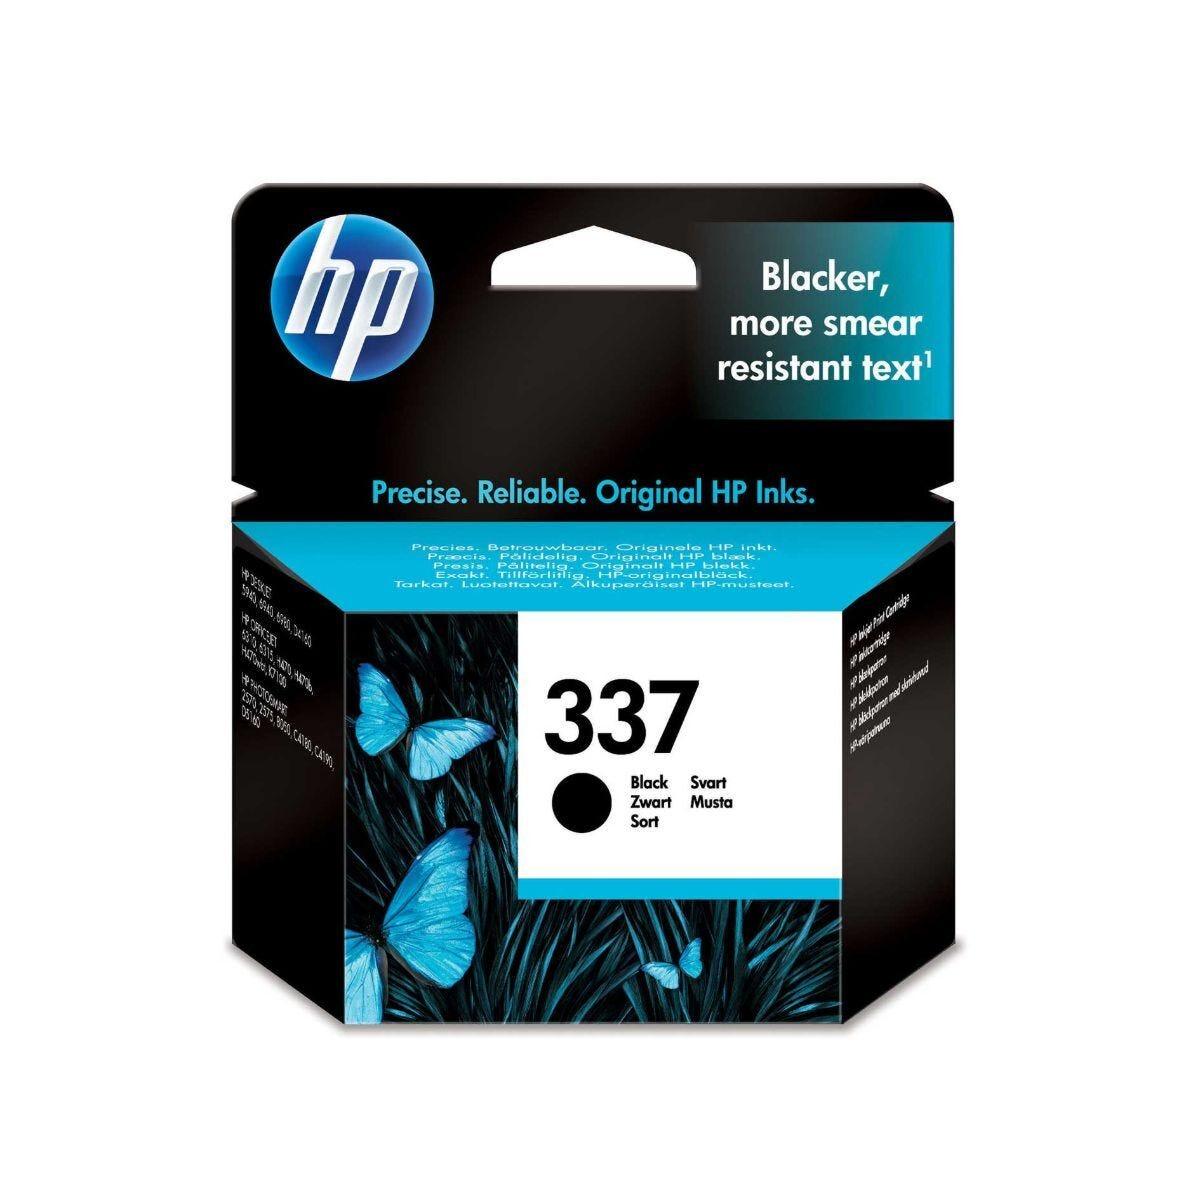 HP 337 Ink Cartridge 11ml